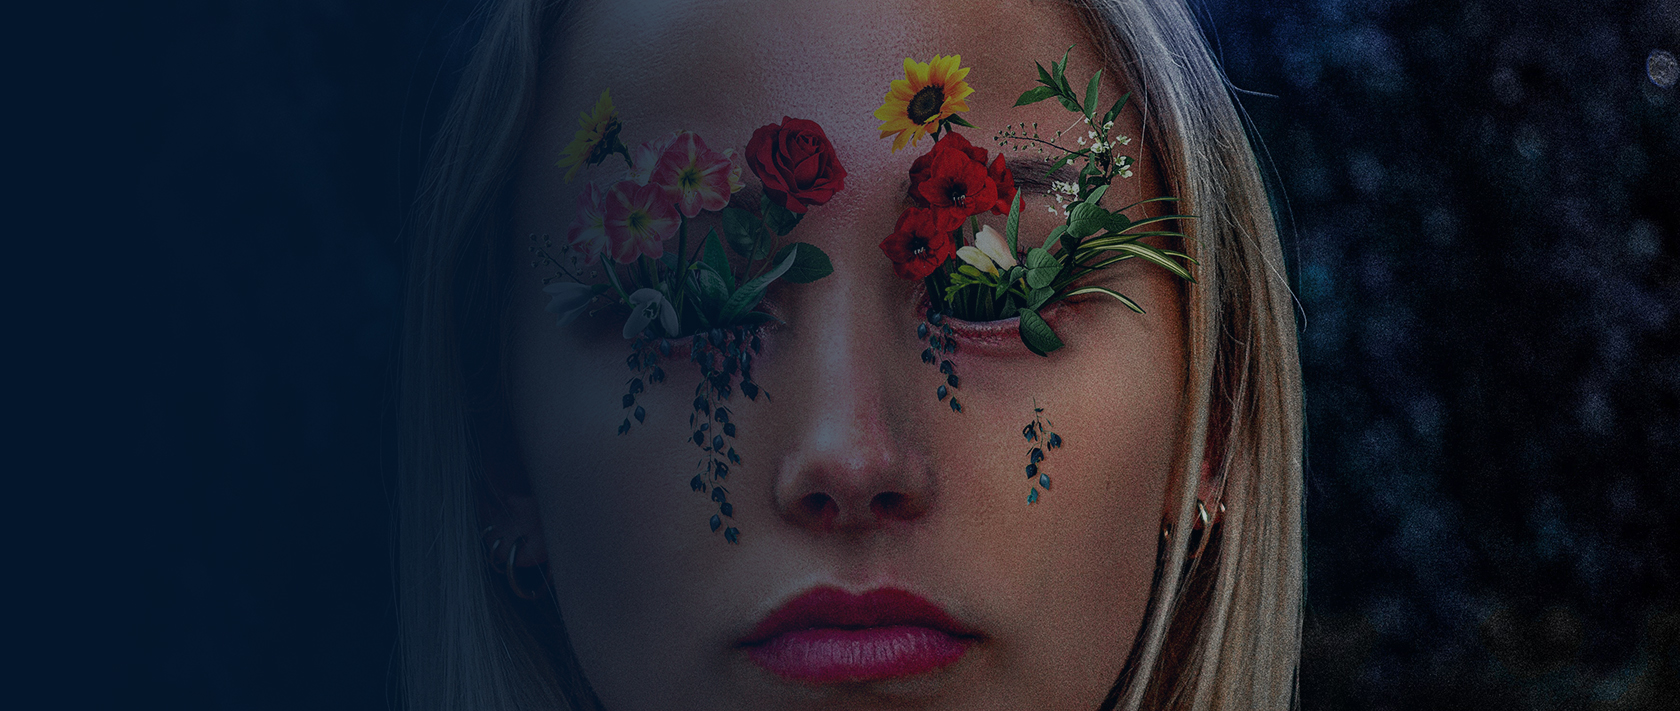 Digital art project Abstract portraits